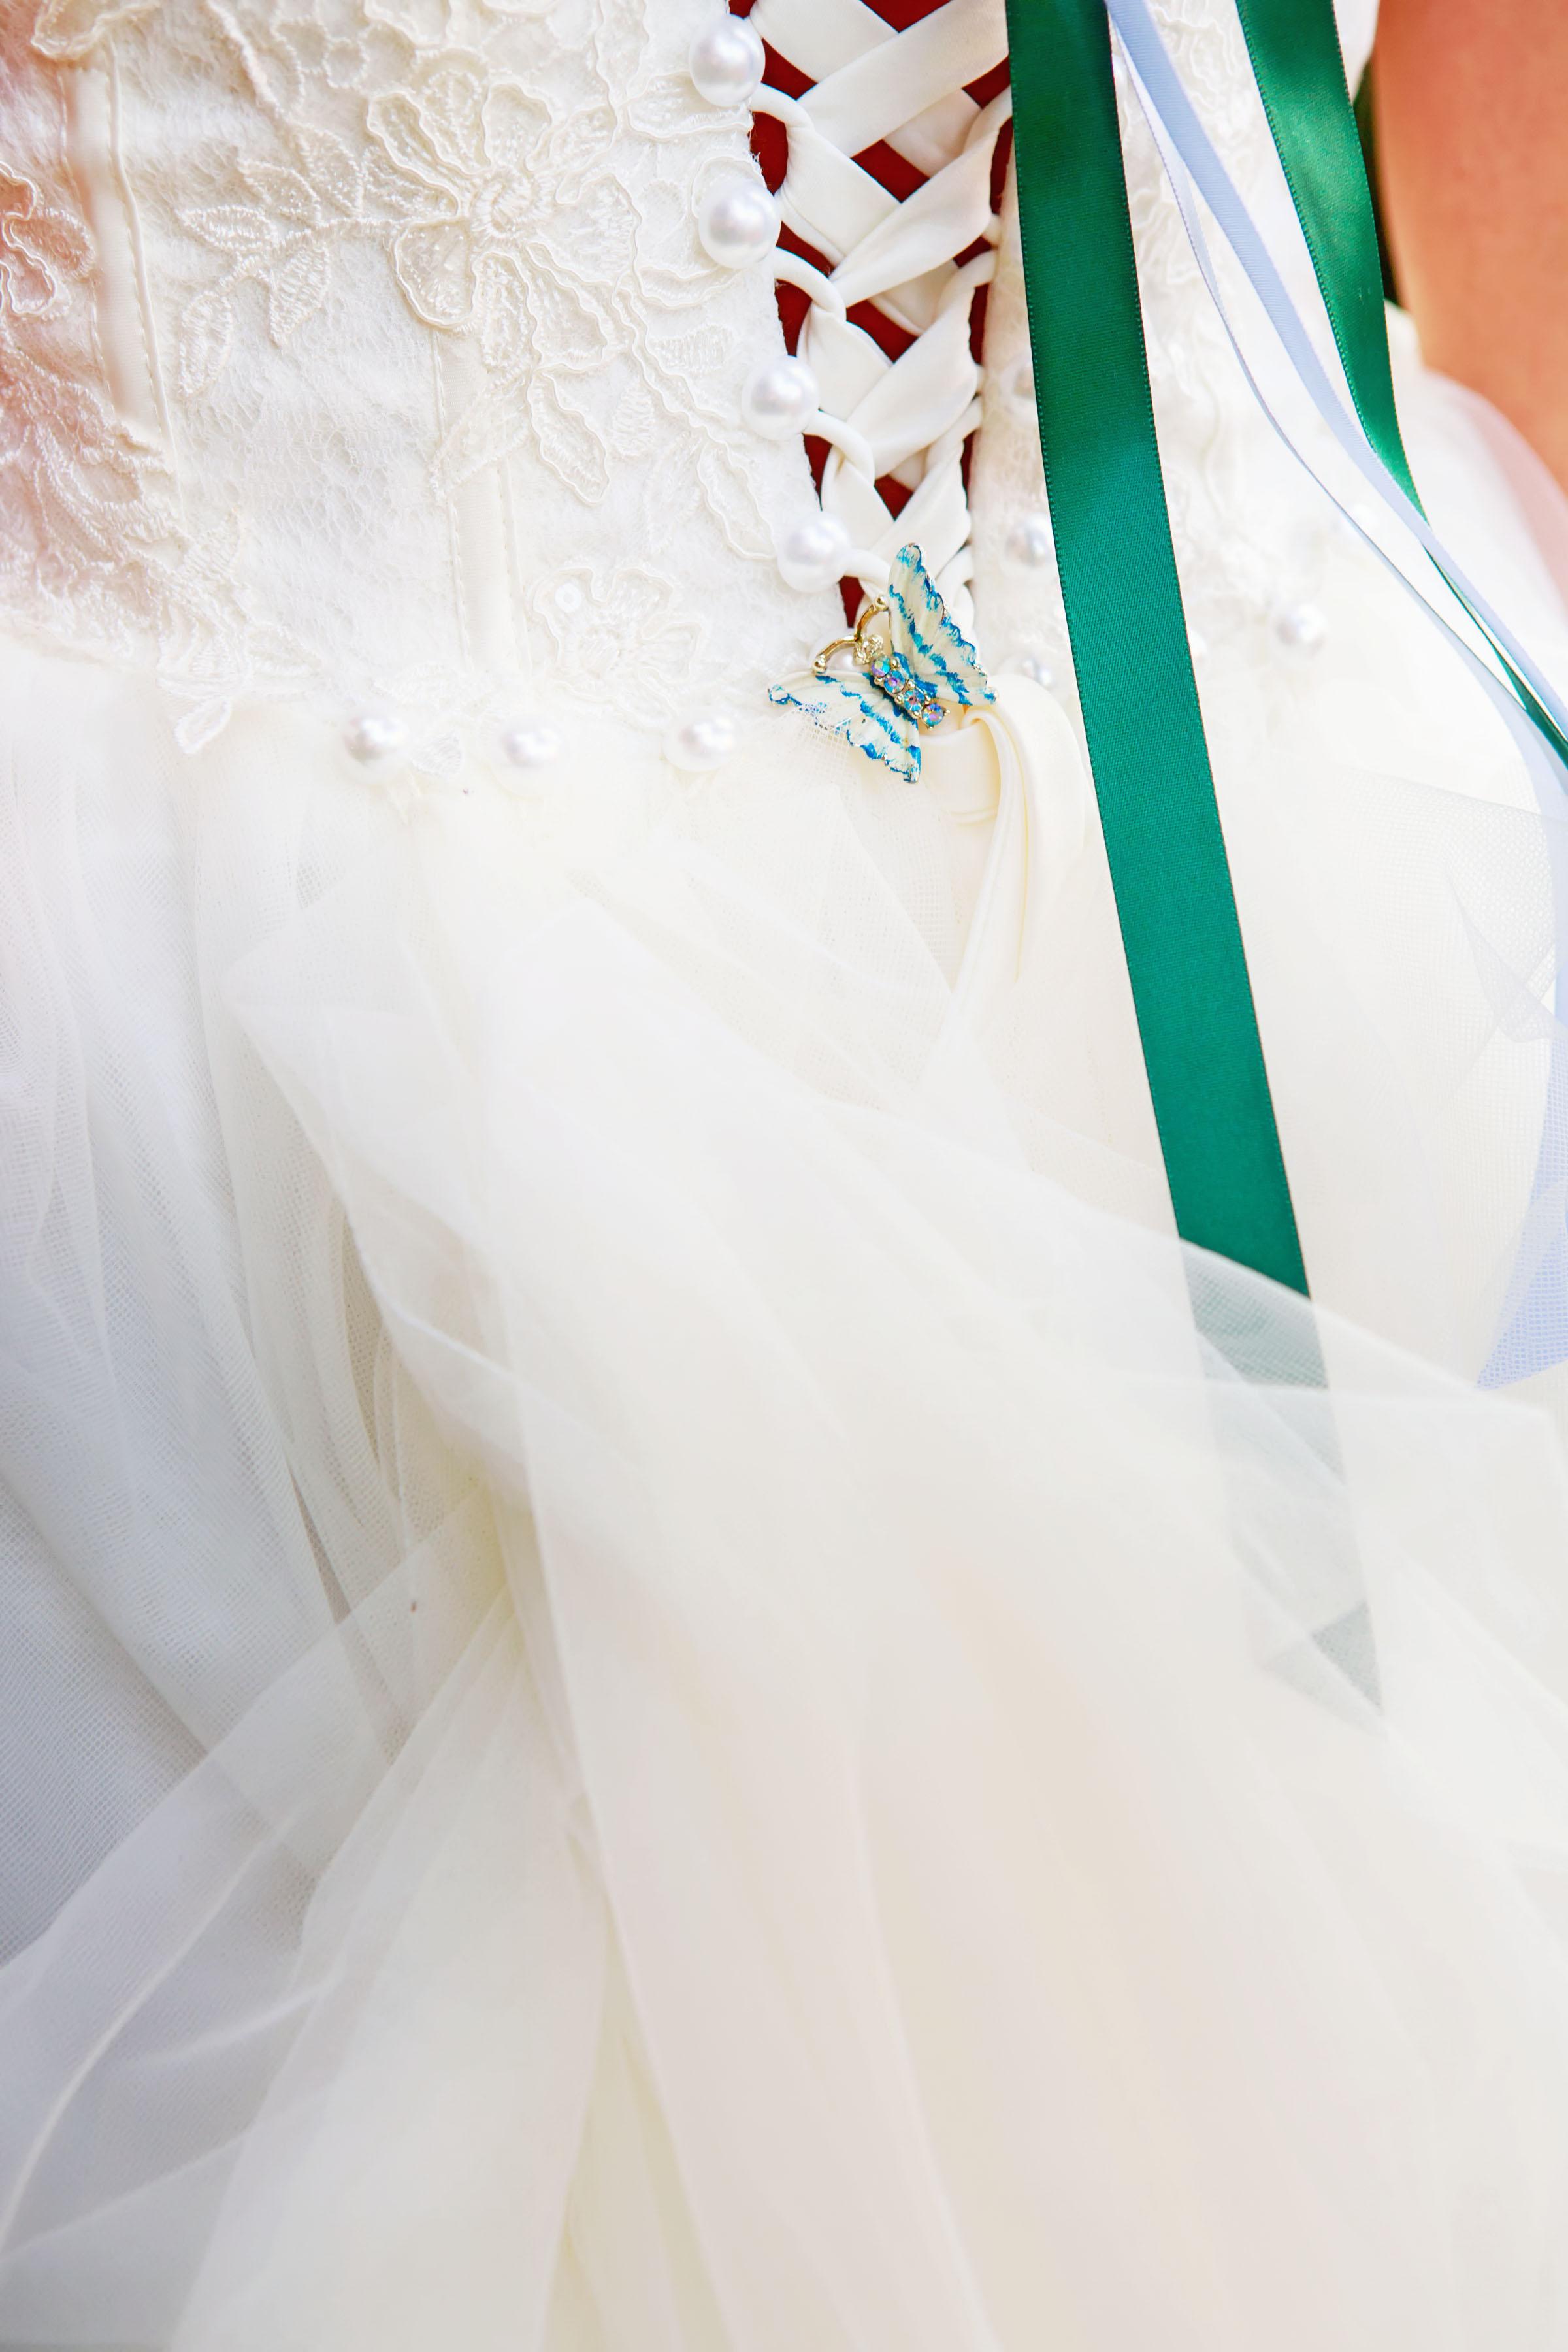 North_Carolina_Wedding_Photographer_Tiffany_Abruzzo_Bride&Groom_14.jpg